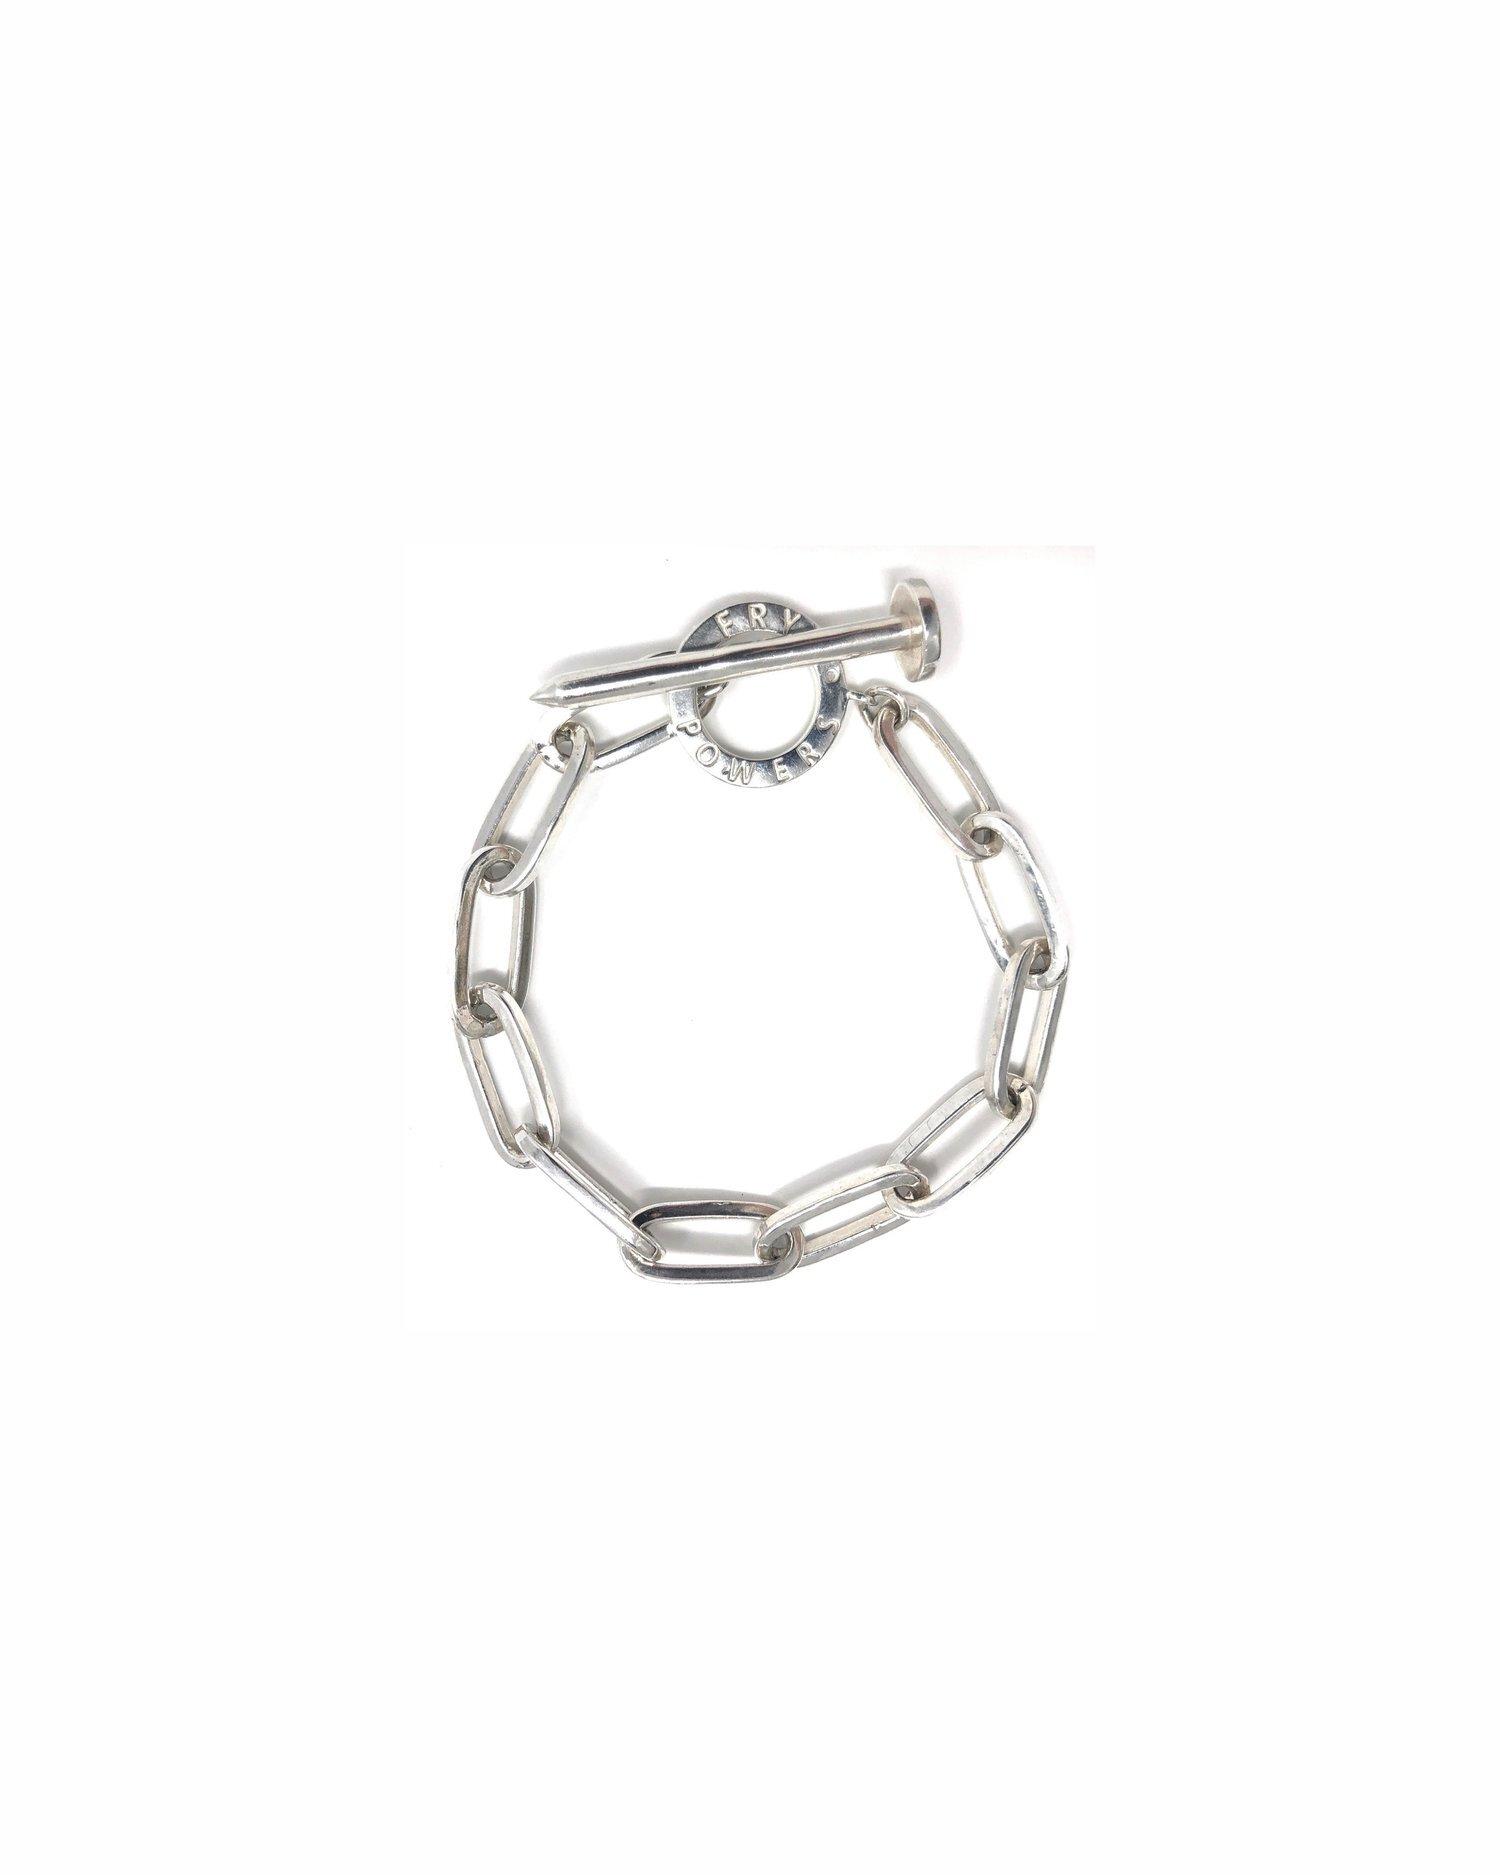 fry-powers-elongated-chain-link-bracelet (1).jpg